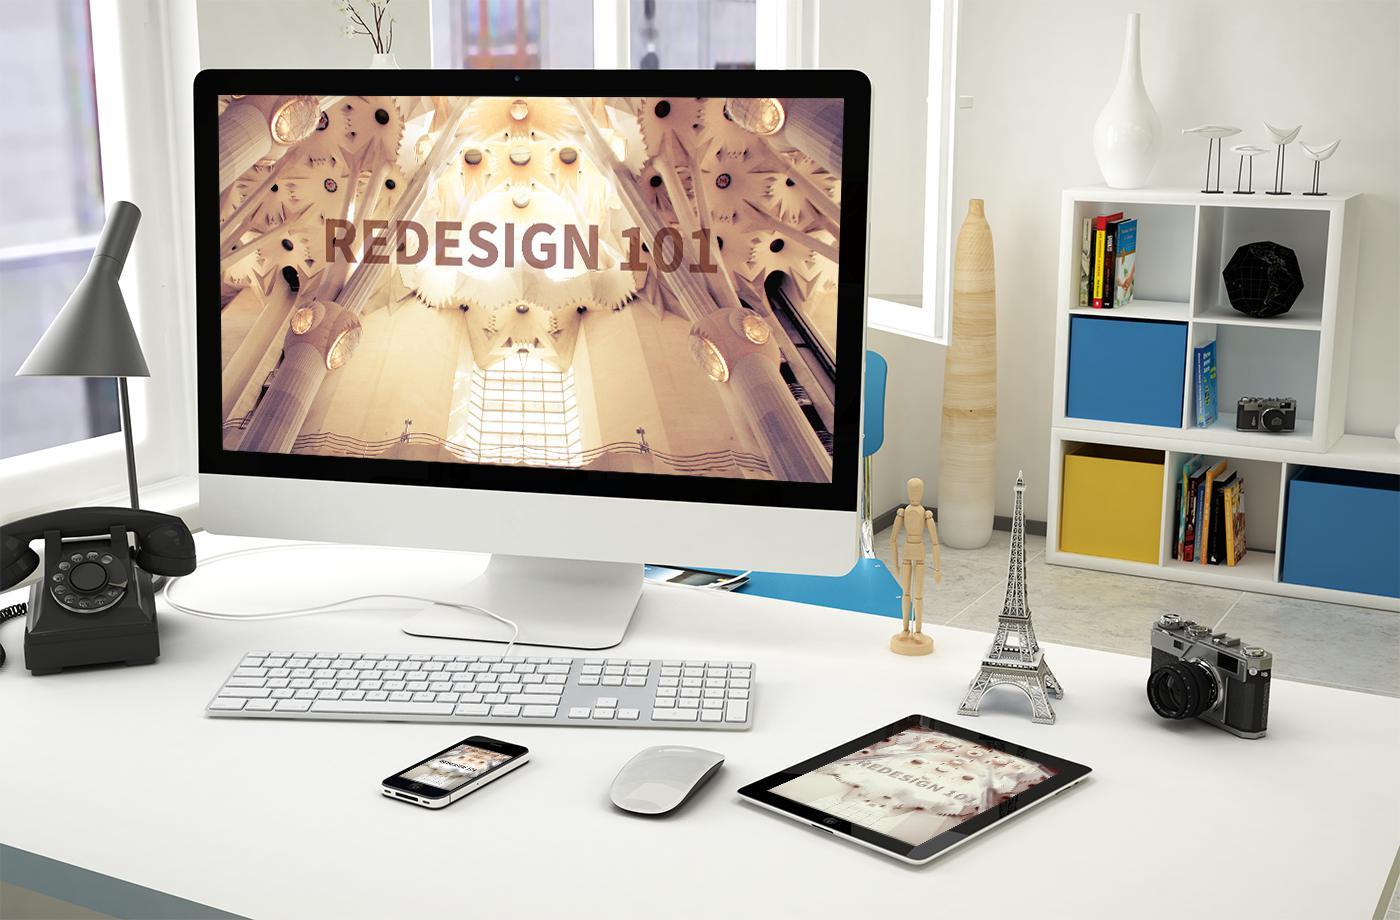 redesign 101